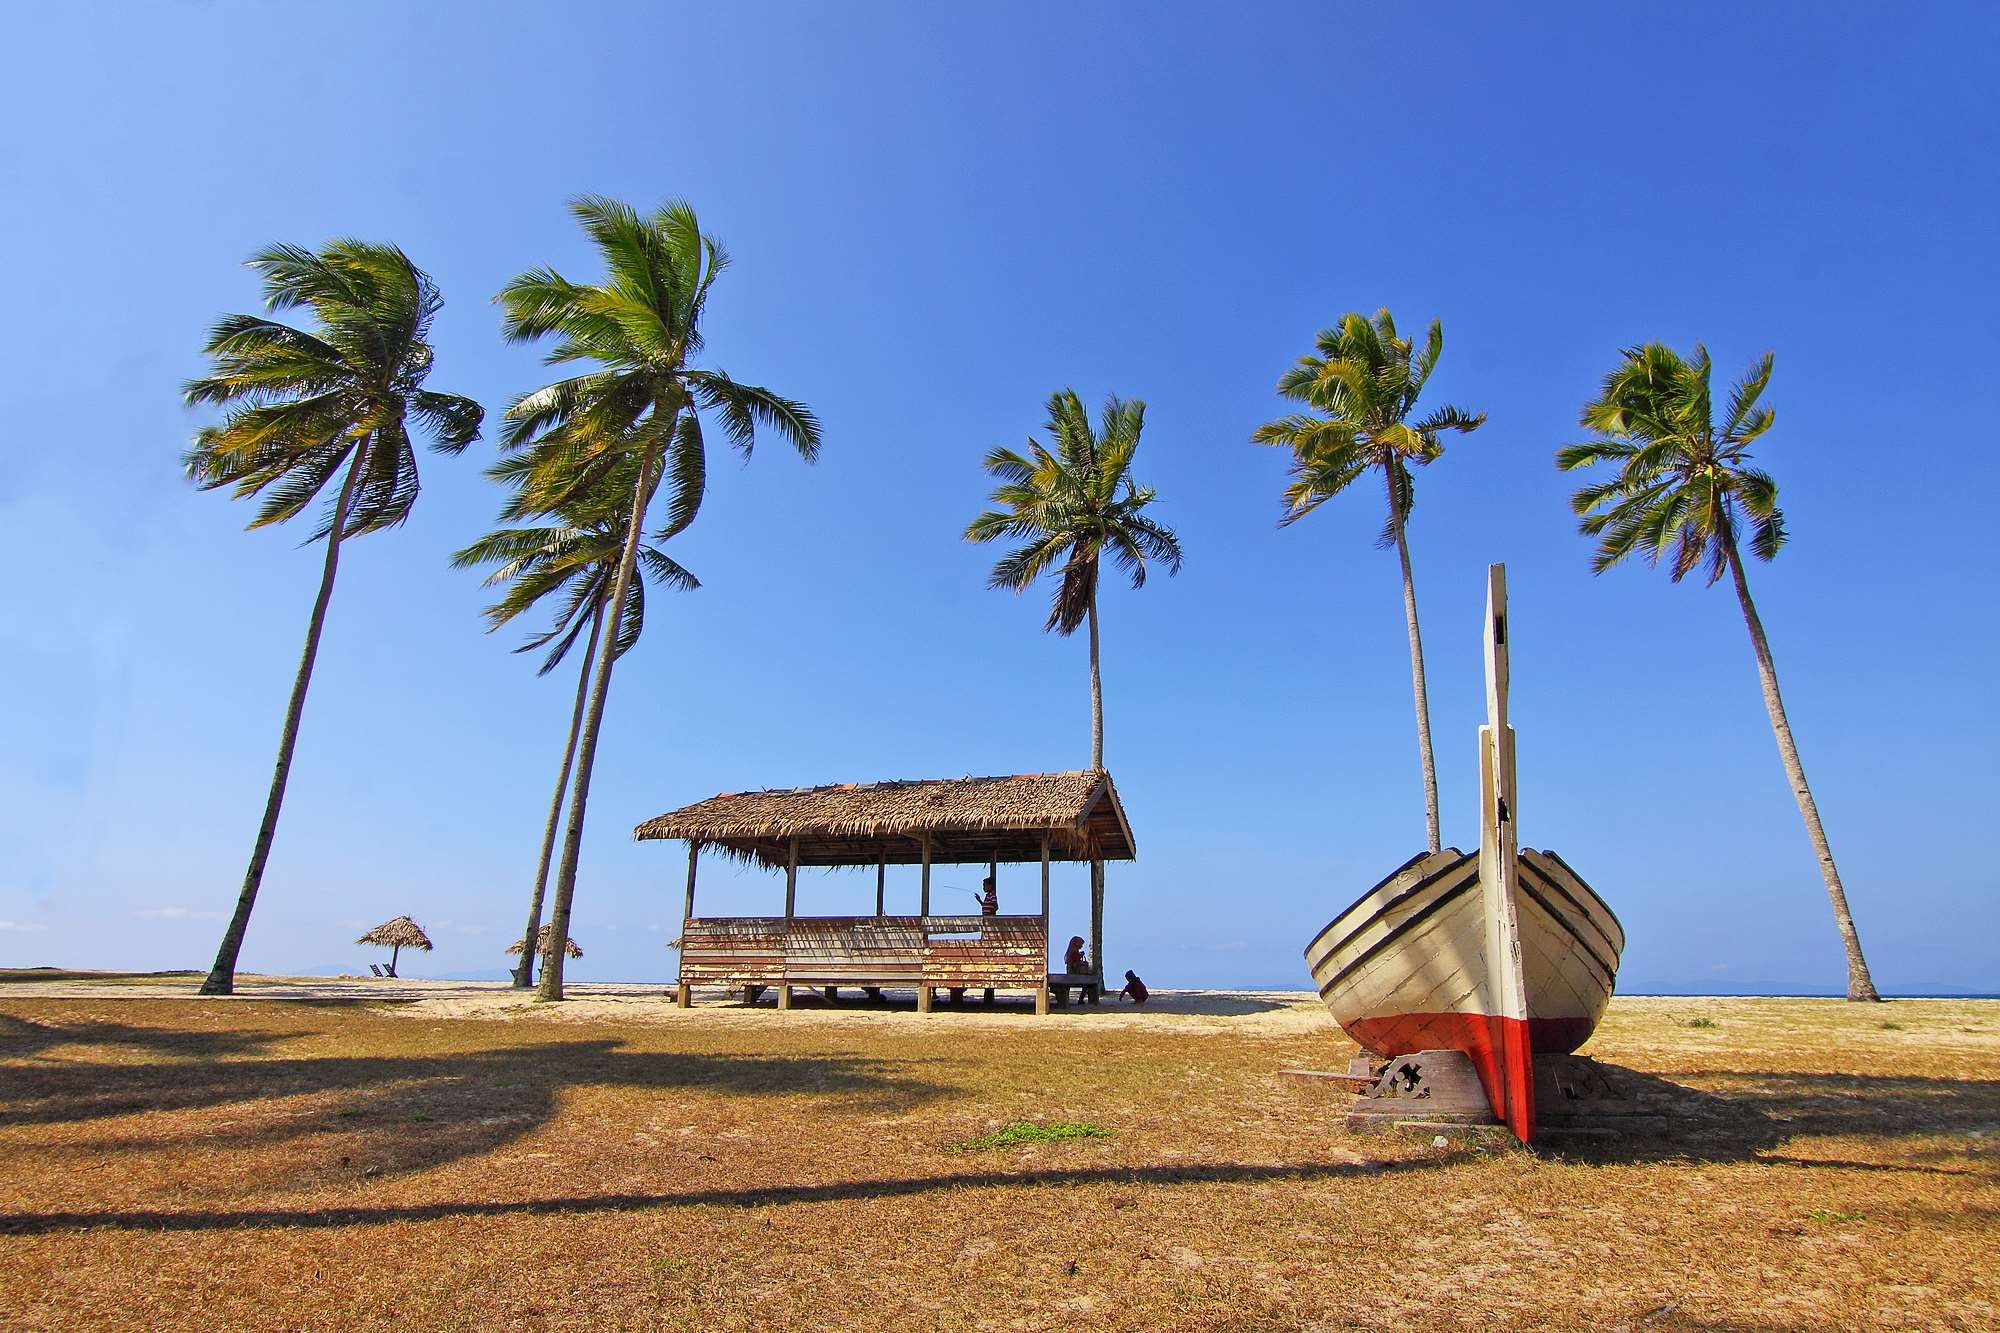 Beach Beach Chairs Blue Boat Chair Hut Landscape Nature Ocean Outdoors Palm Palm Trees People Resort Sand Sea Seascape Seashore Trees Tropica